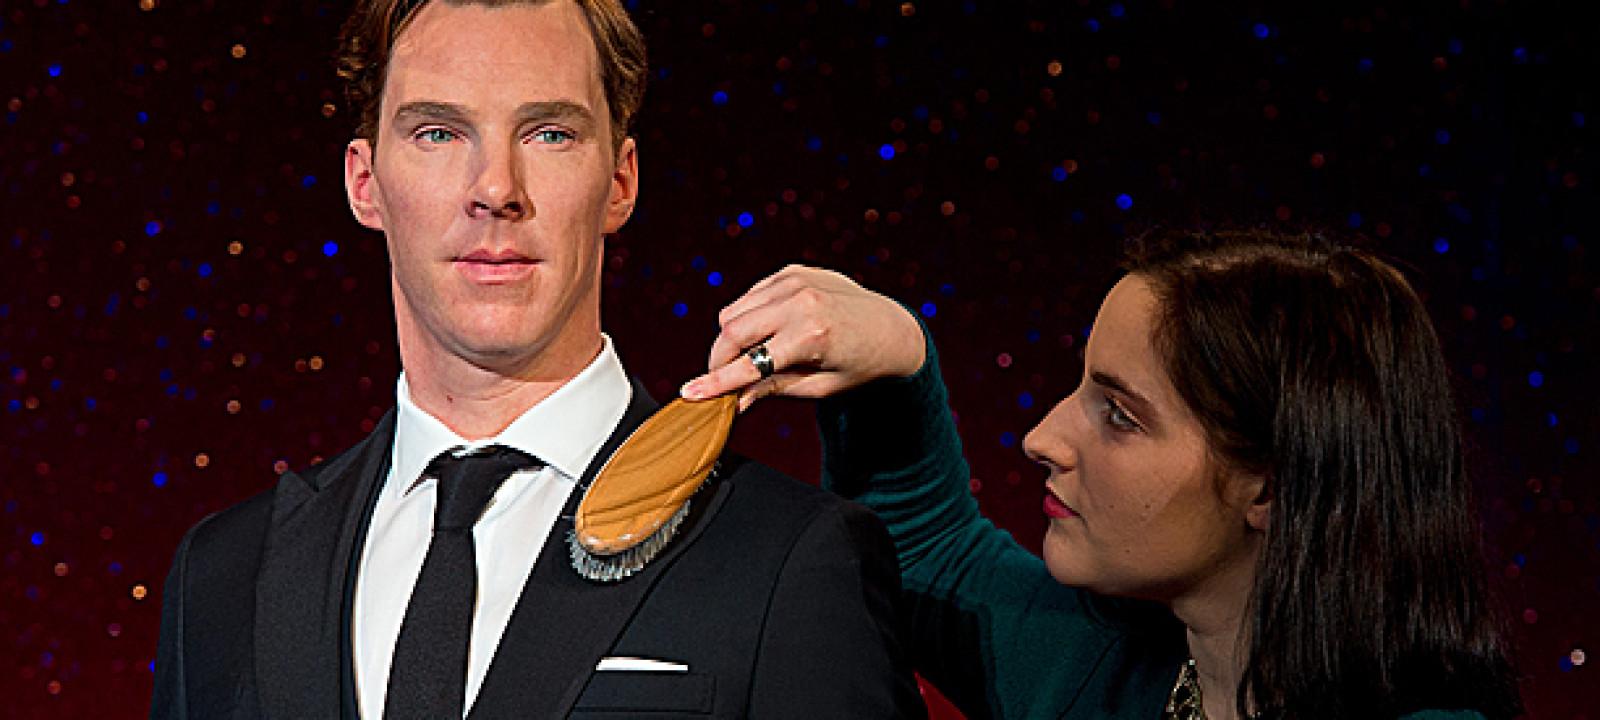 Benedict Cumberbatch's waxwork